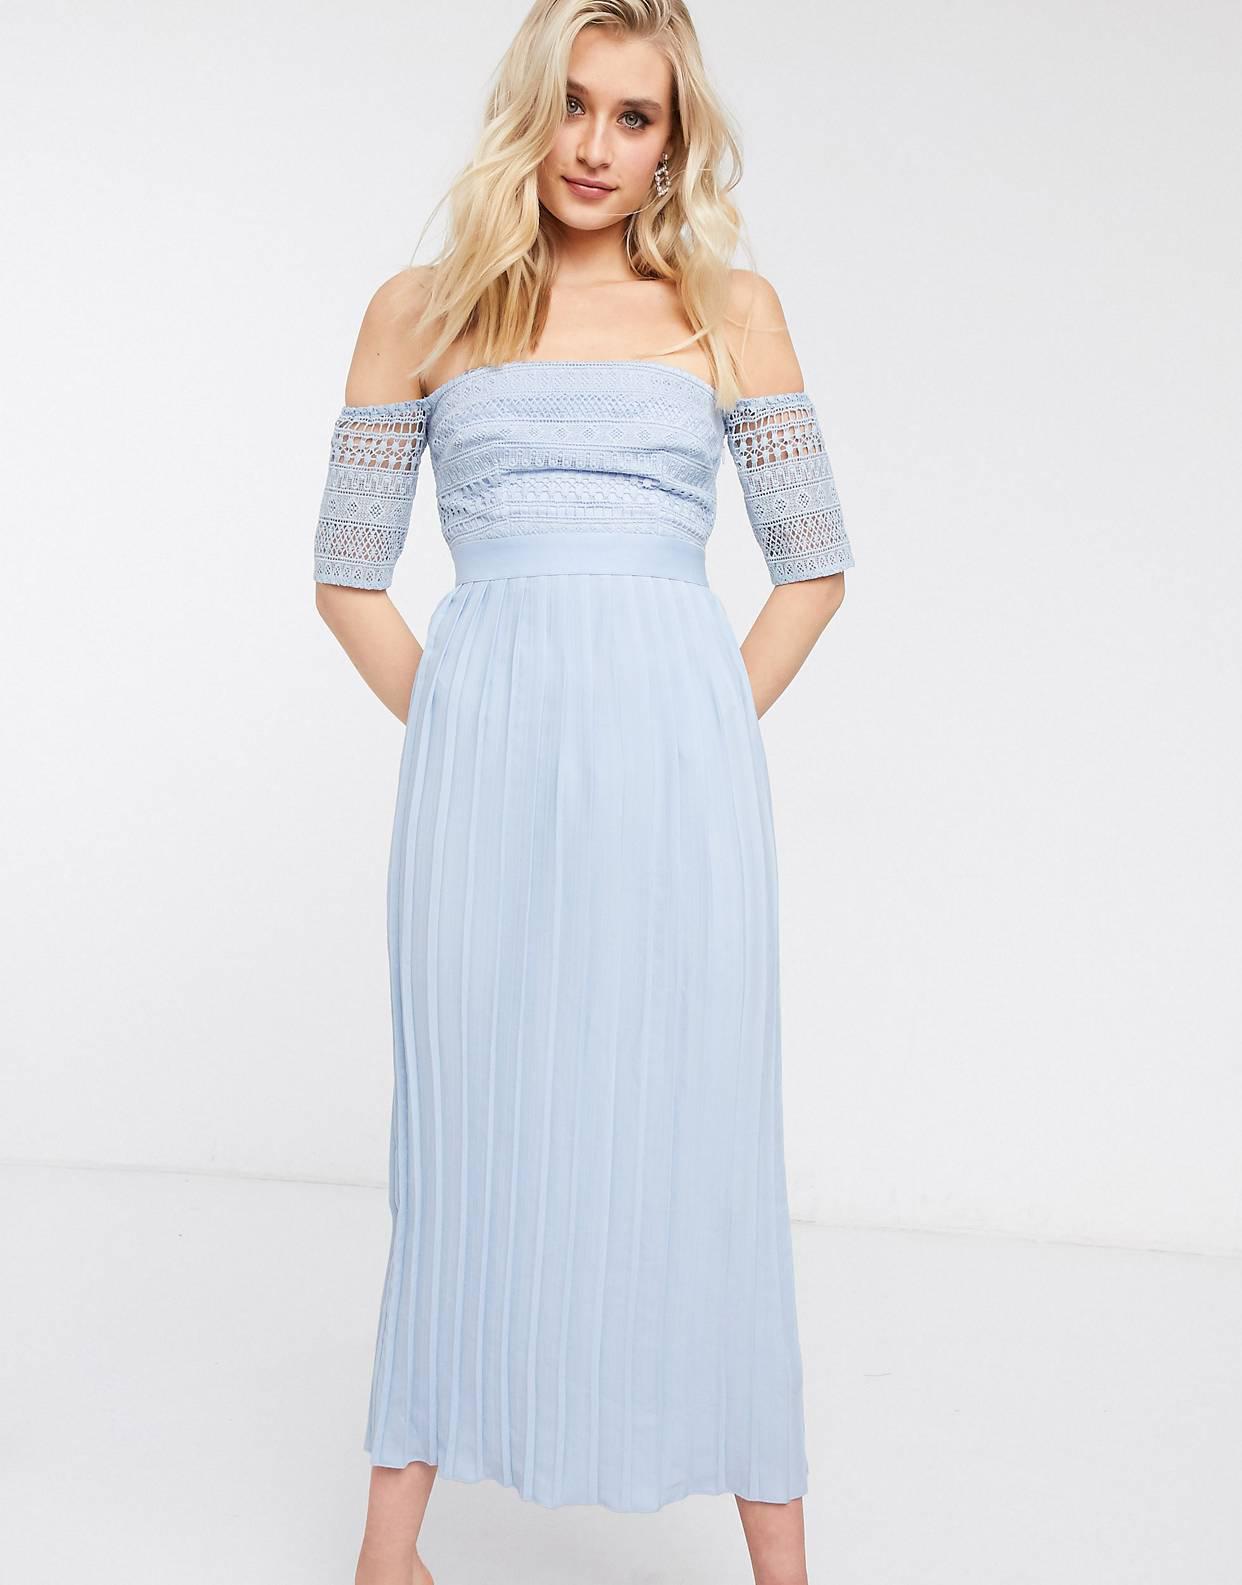 Vestido semilargo azul de encaje con diseño plisado de Little Mistress Tall